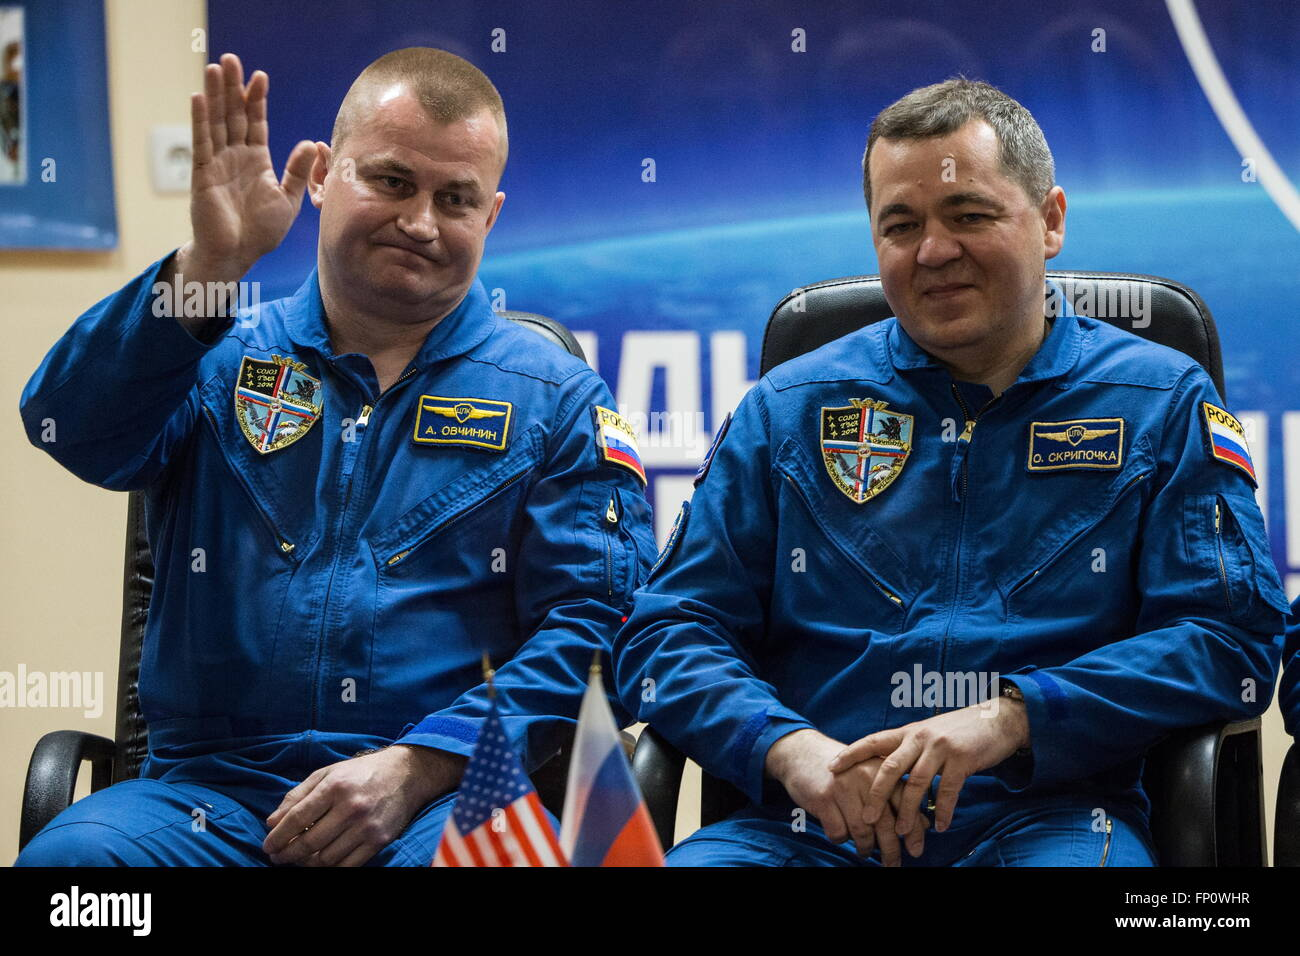 Baikonur, Kazakhstan. 17th Mar, 2016. International Space Station Expedition 47/48 main crew members, cosmonaut - Stock Image